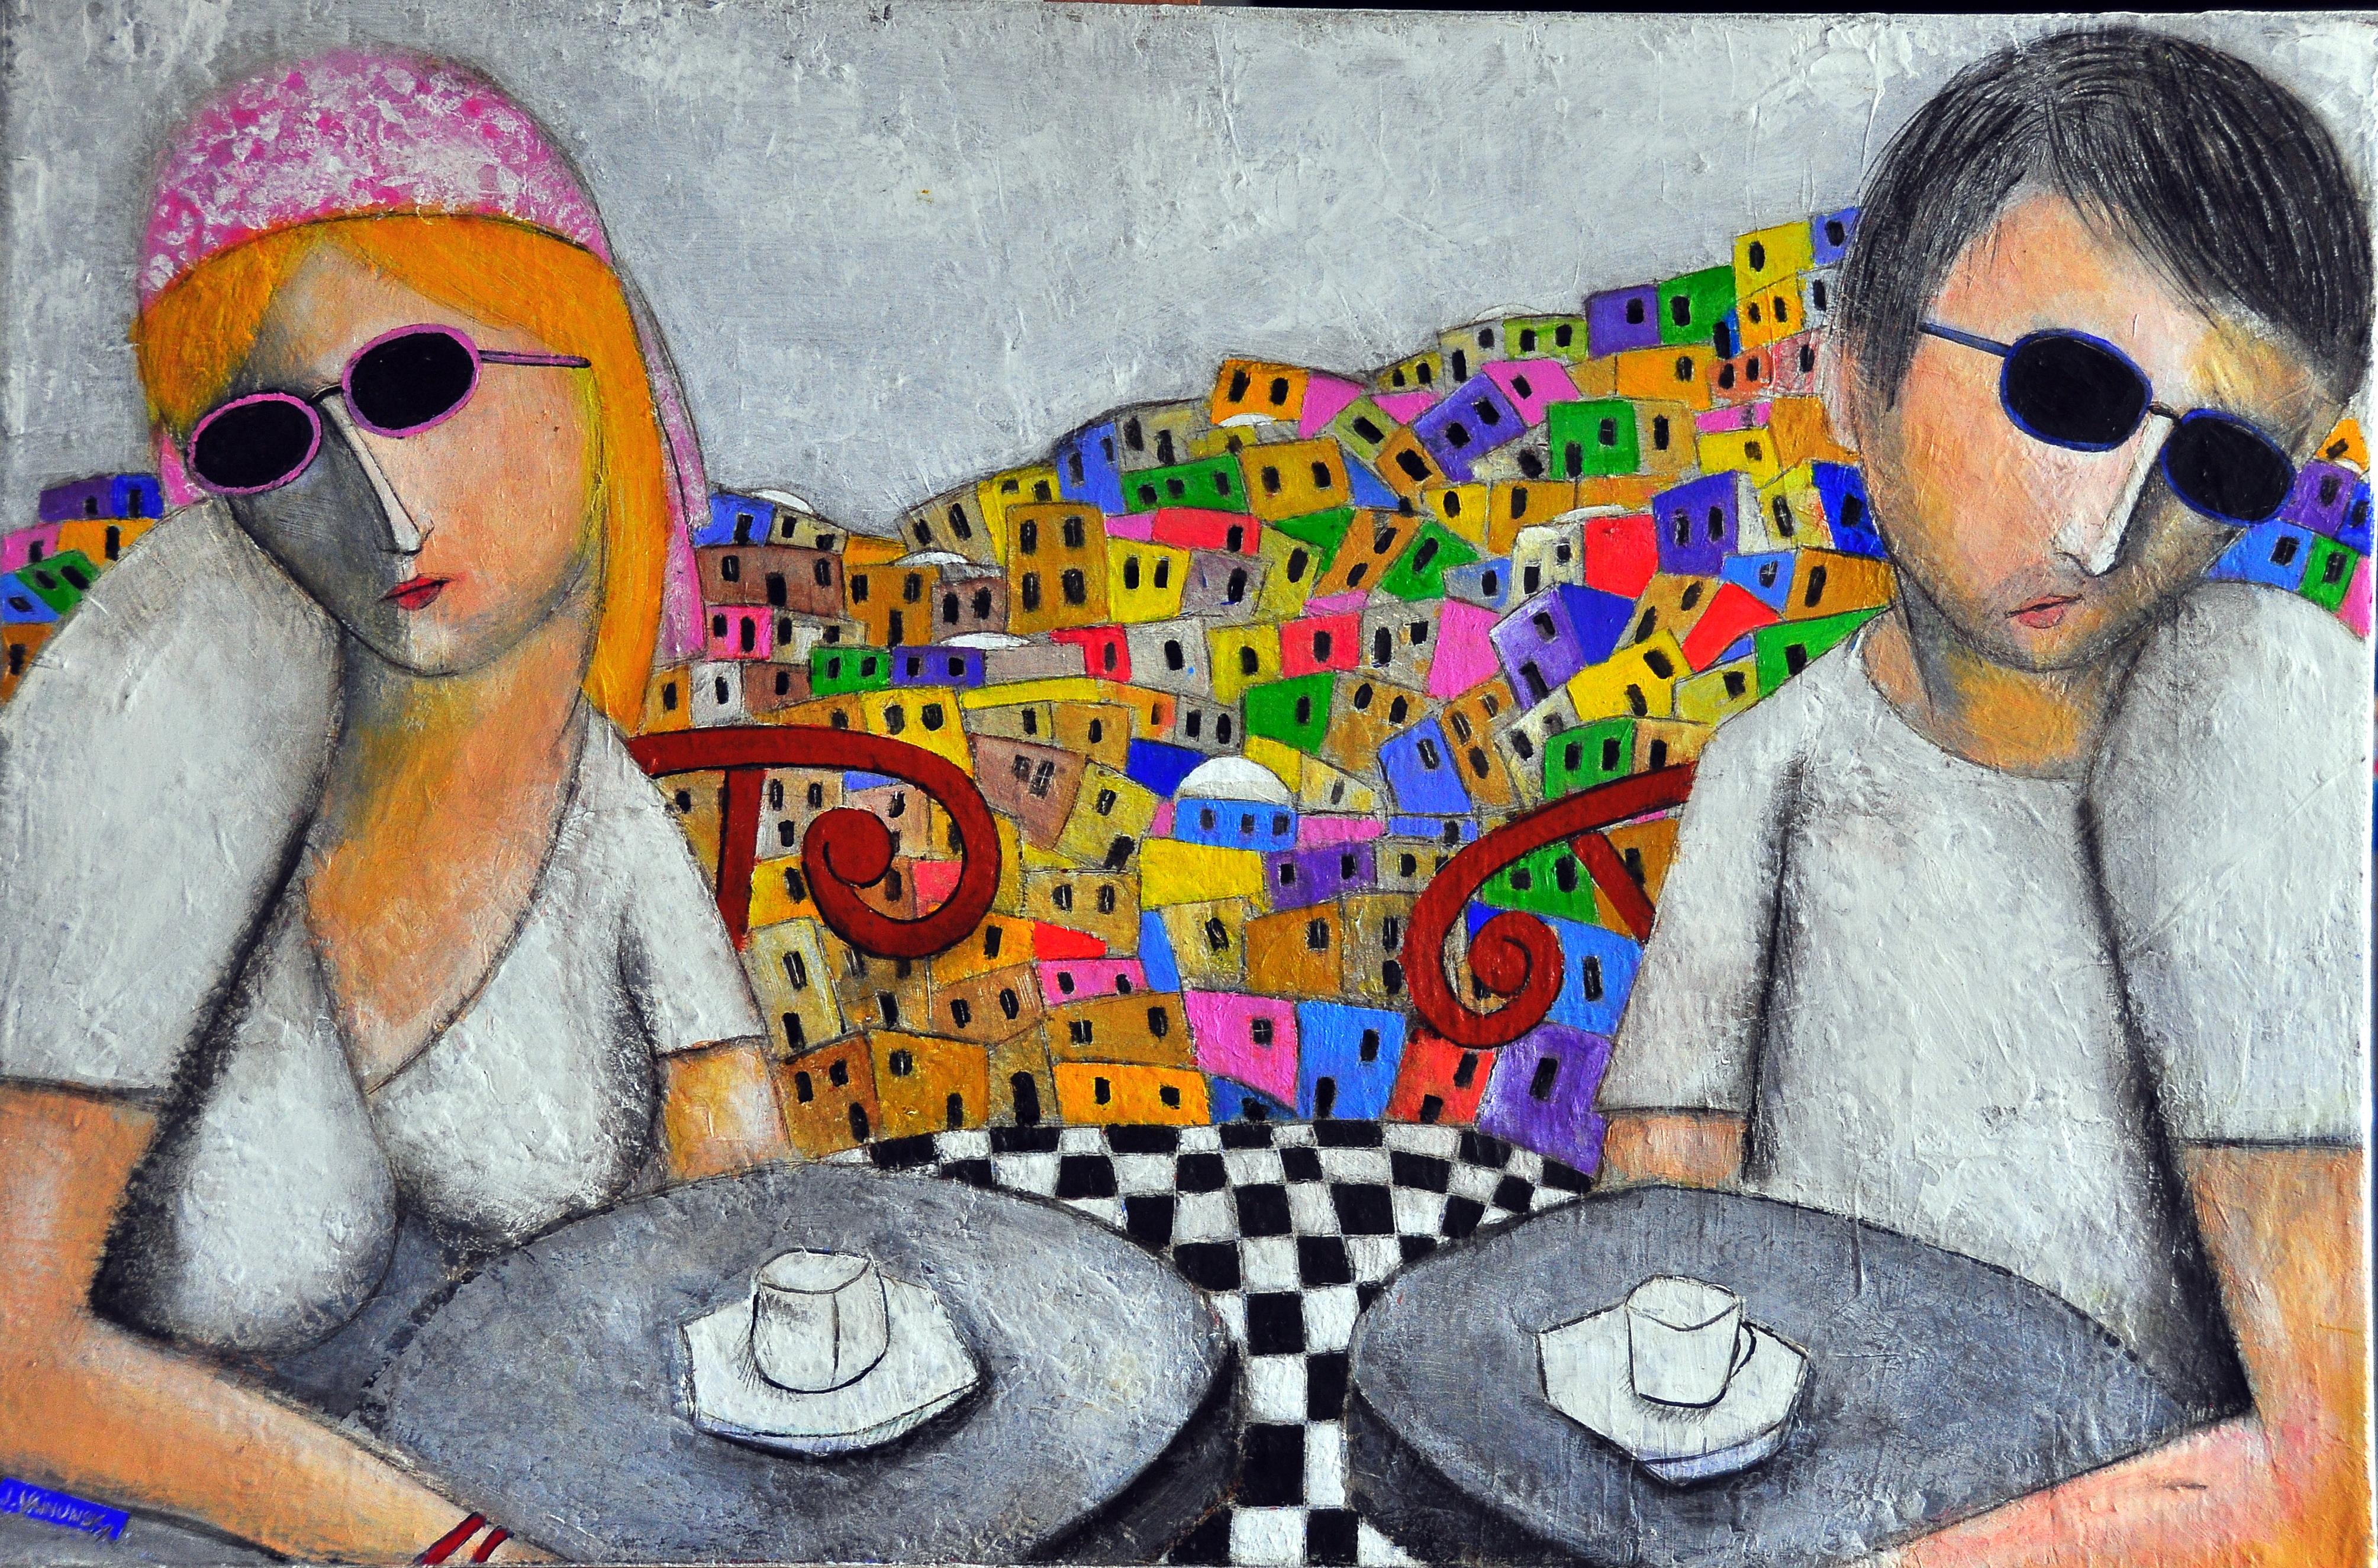 THE LOVERS OF JERUSALEM, Acrylic, 77 x 5